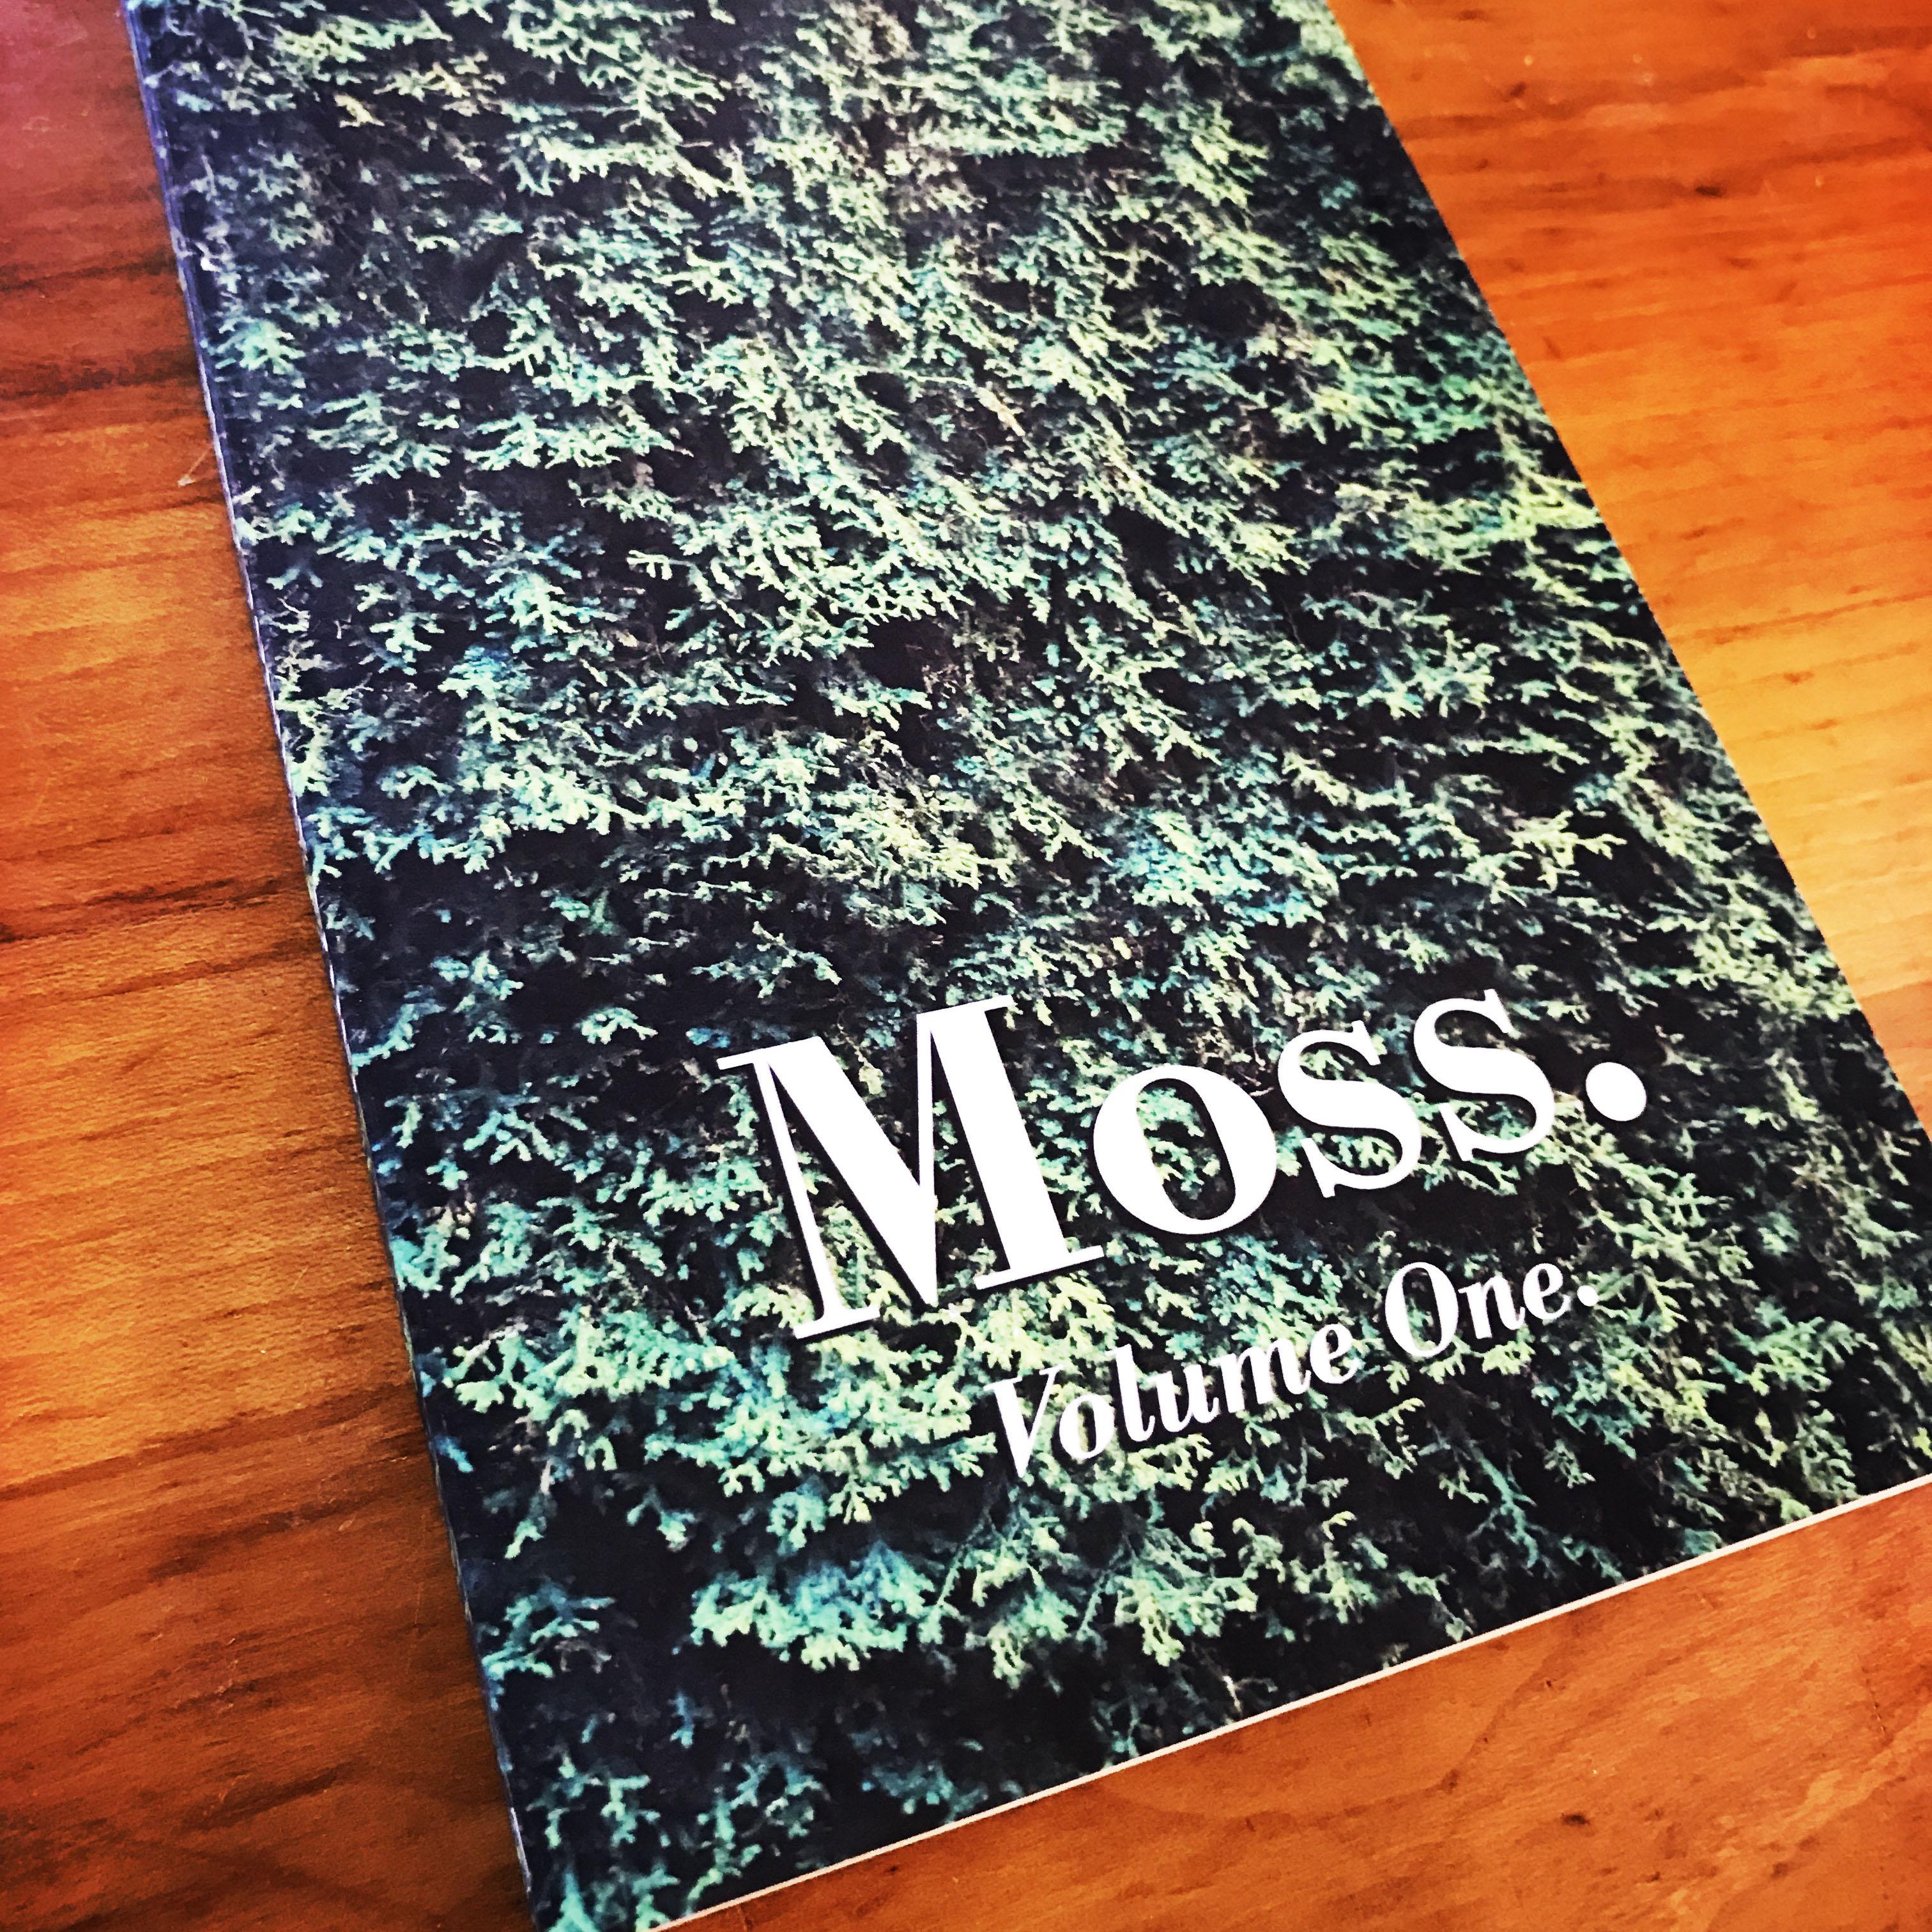 Moss Volume One